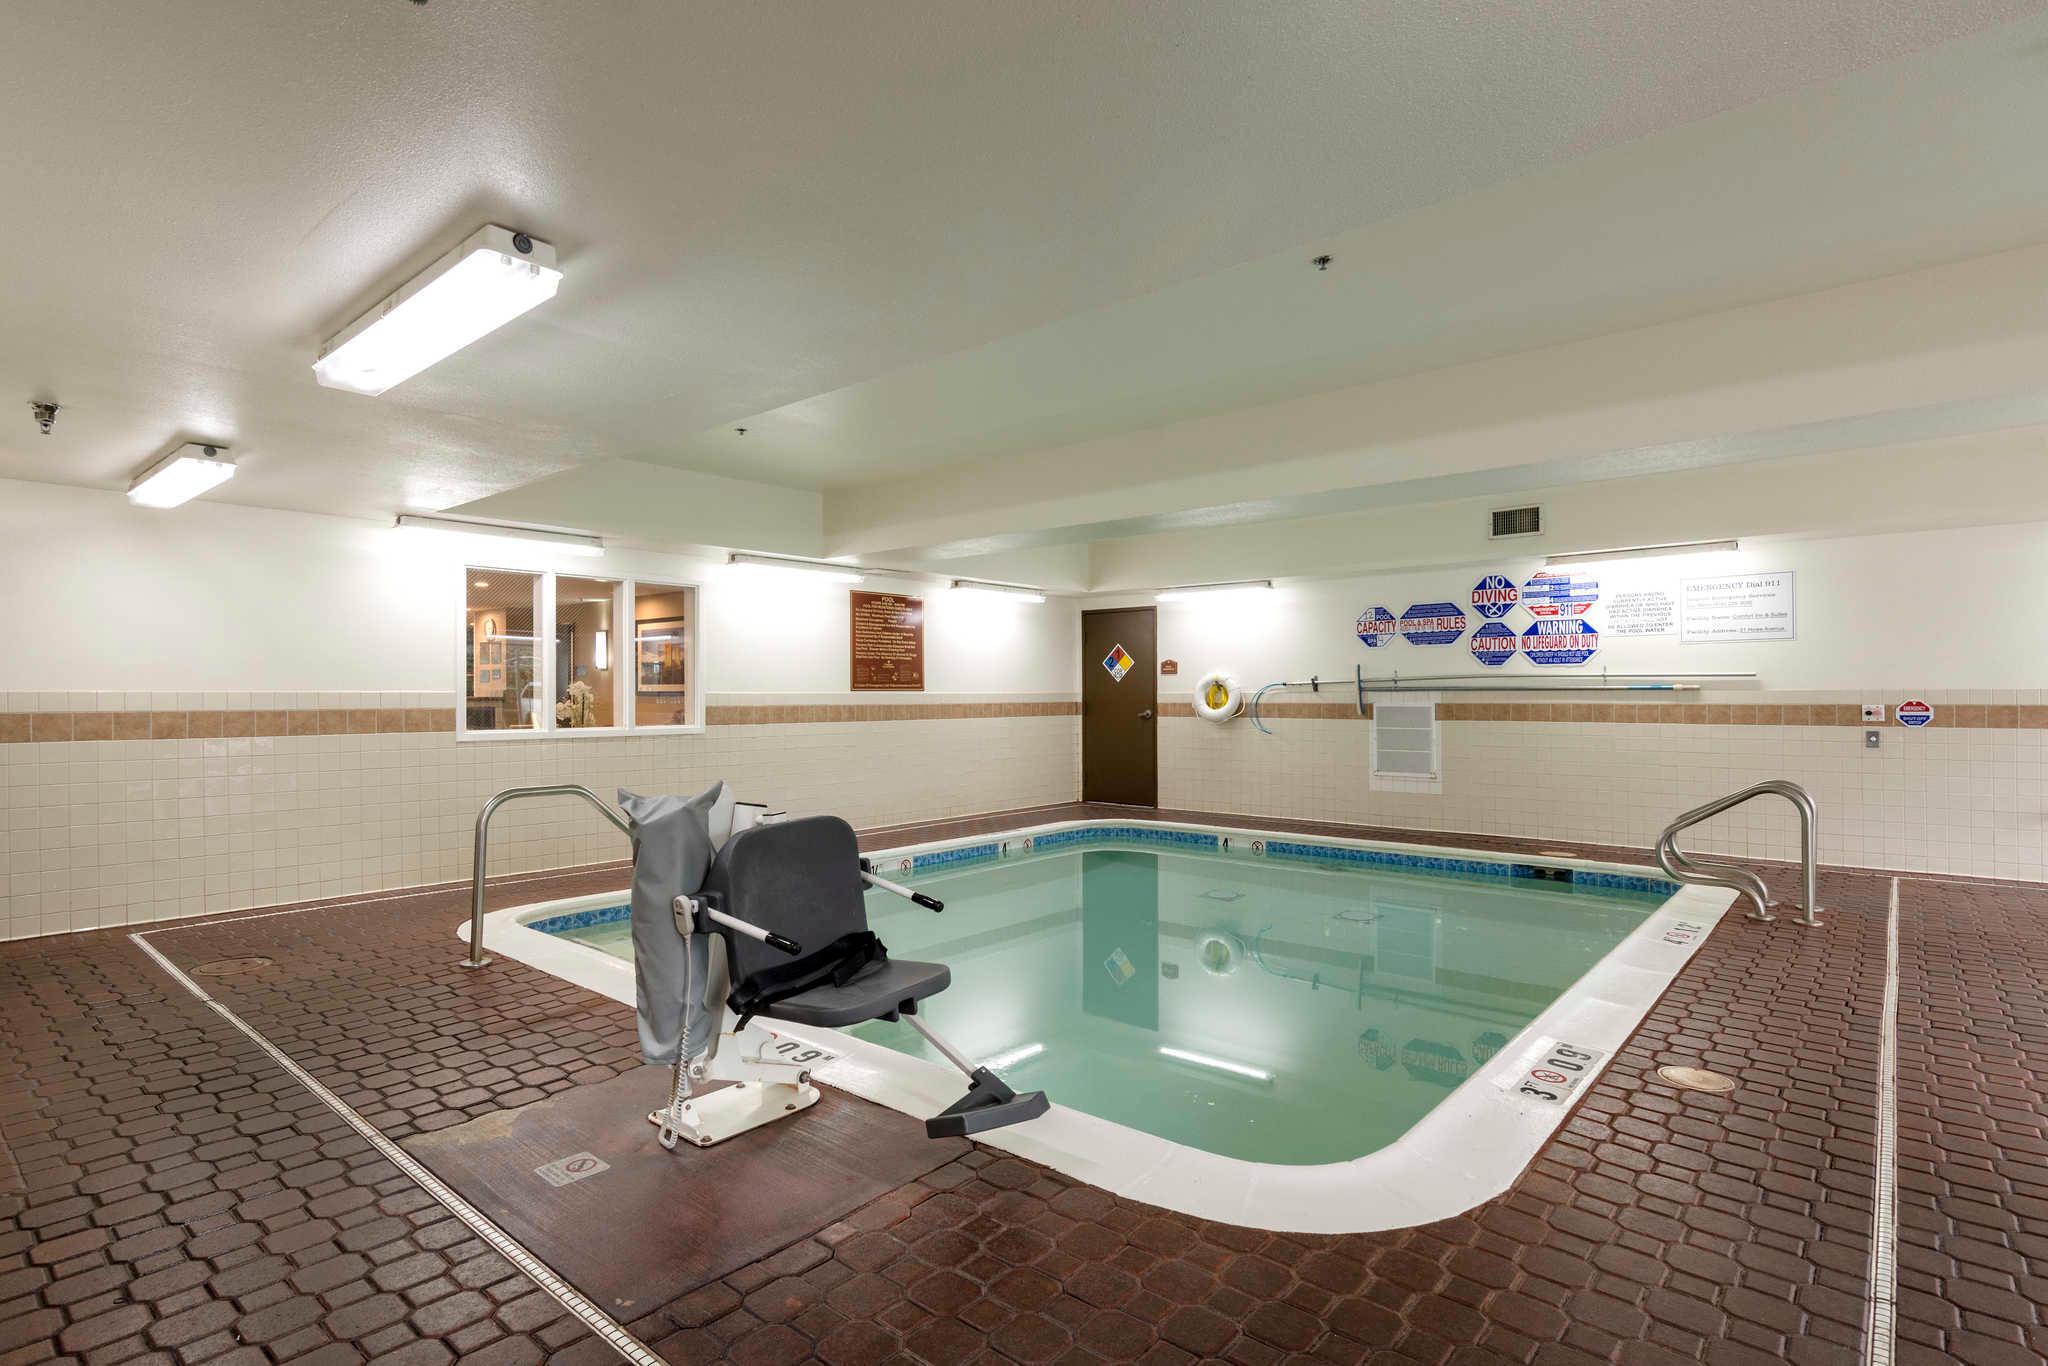 Comfort Inn & Suites Sacramento - University Area image 29